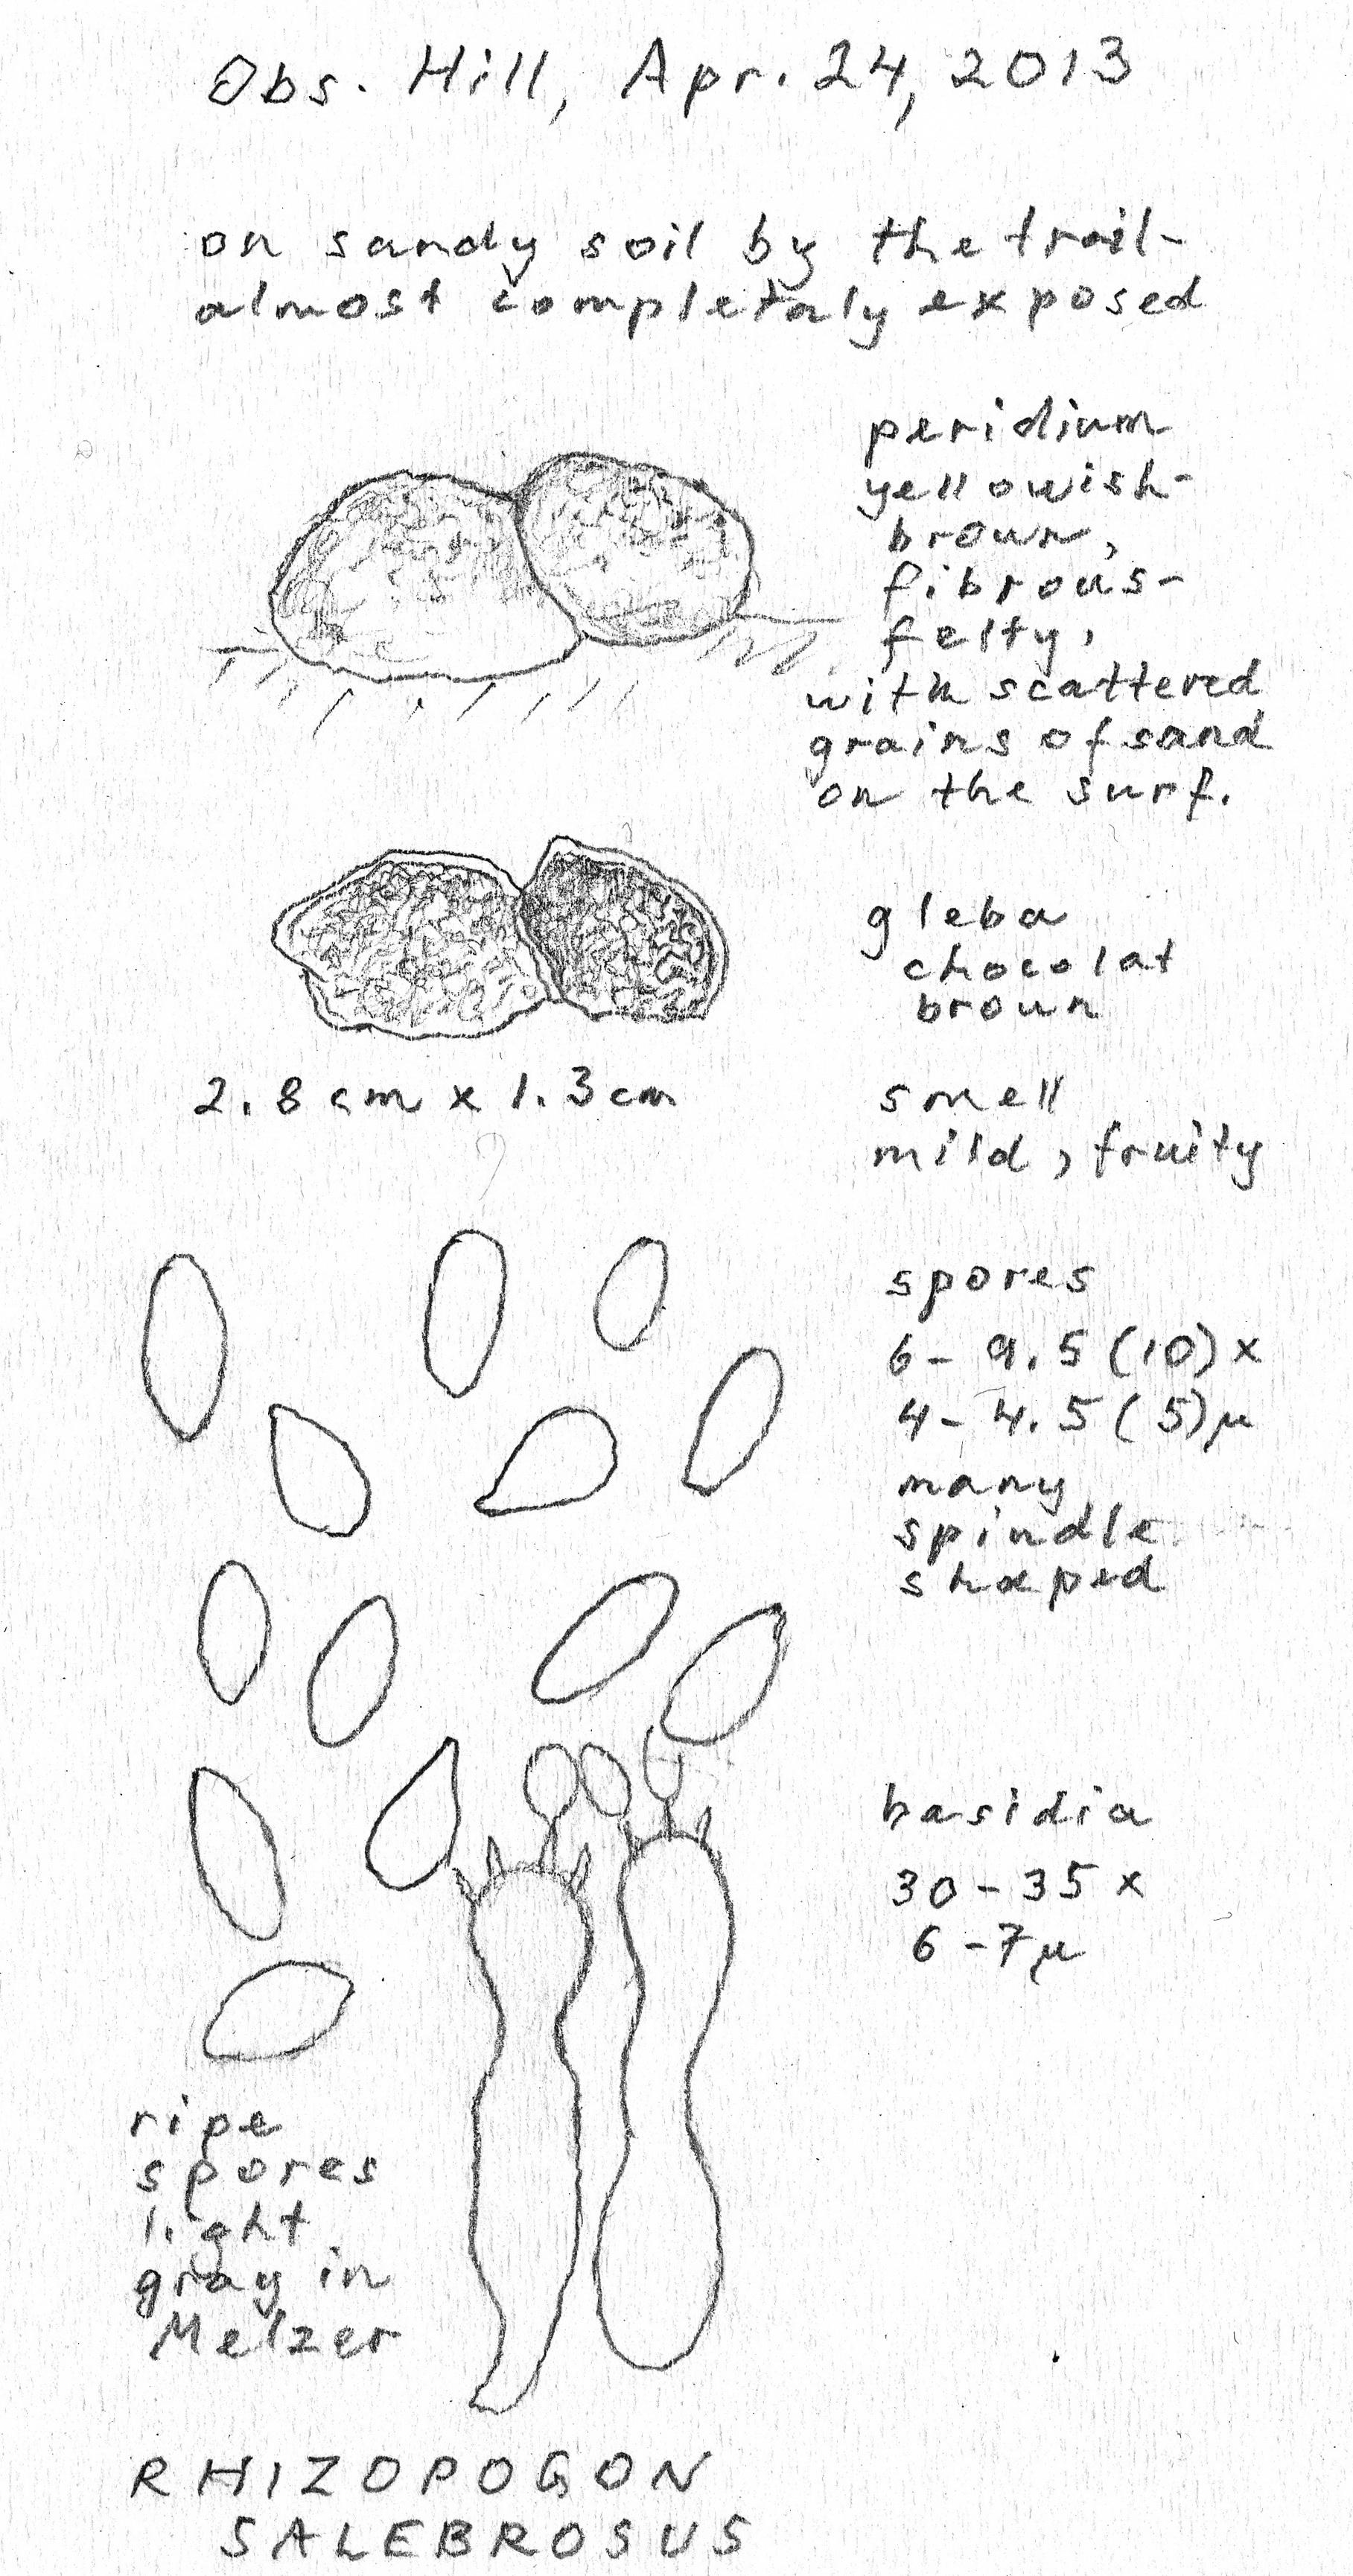 Rhizopogon salebrosus image